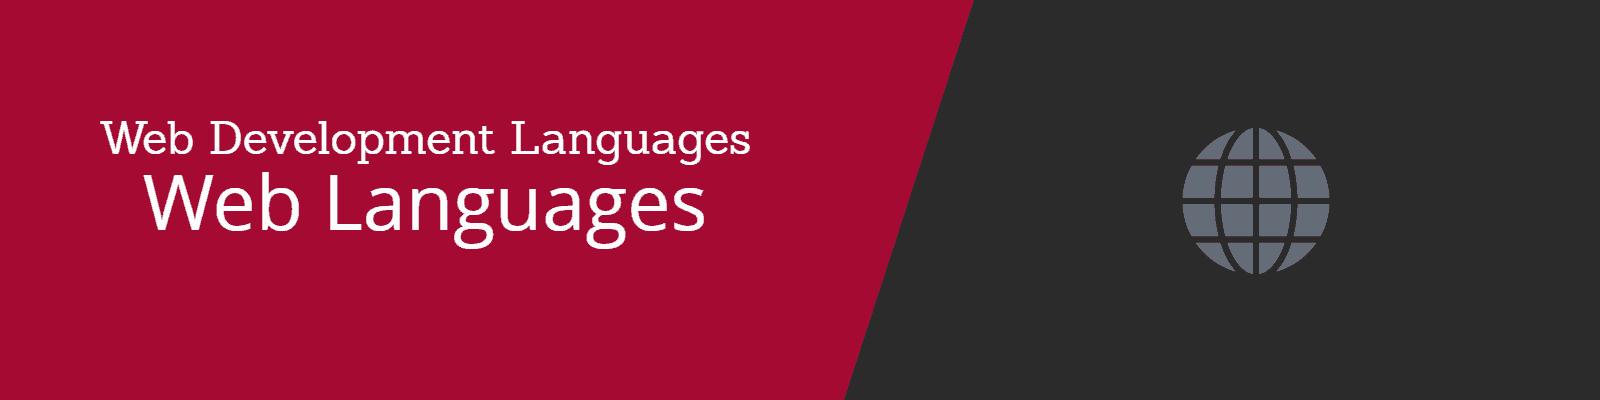 Programming and Web Development - Popular Web Languages